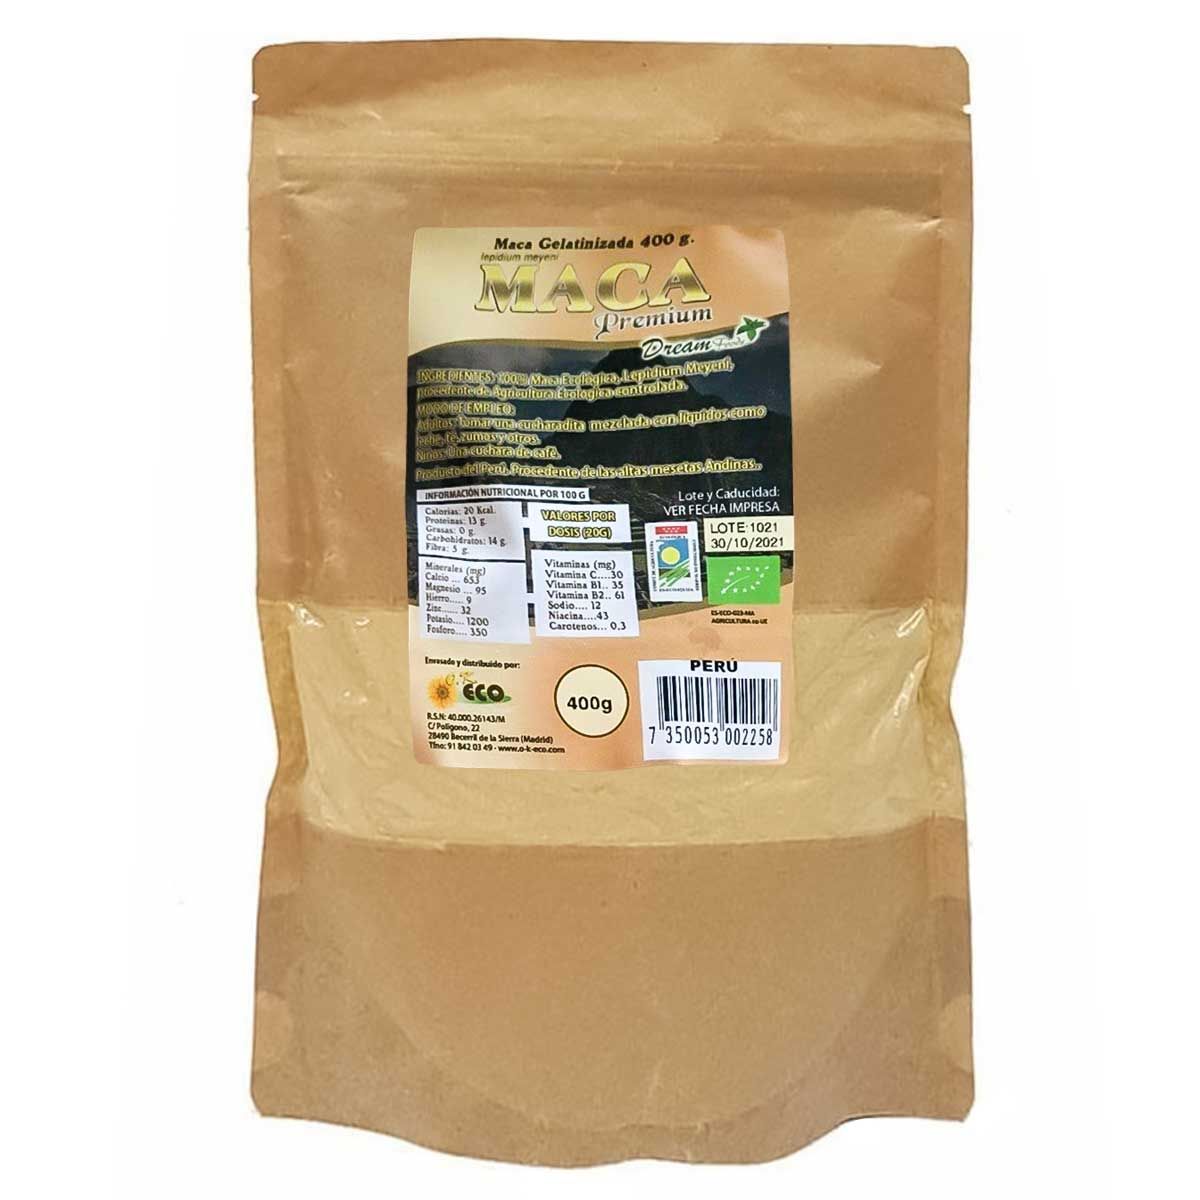 Maca Gelatinizada Dream Foods 400g